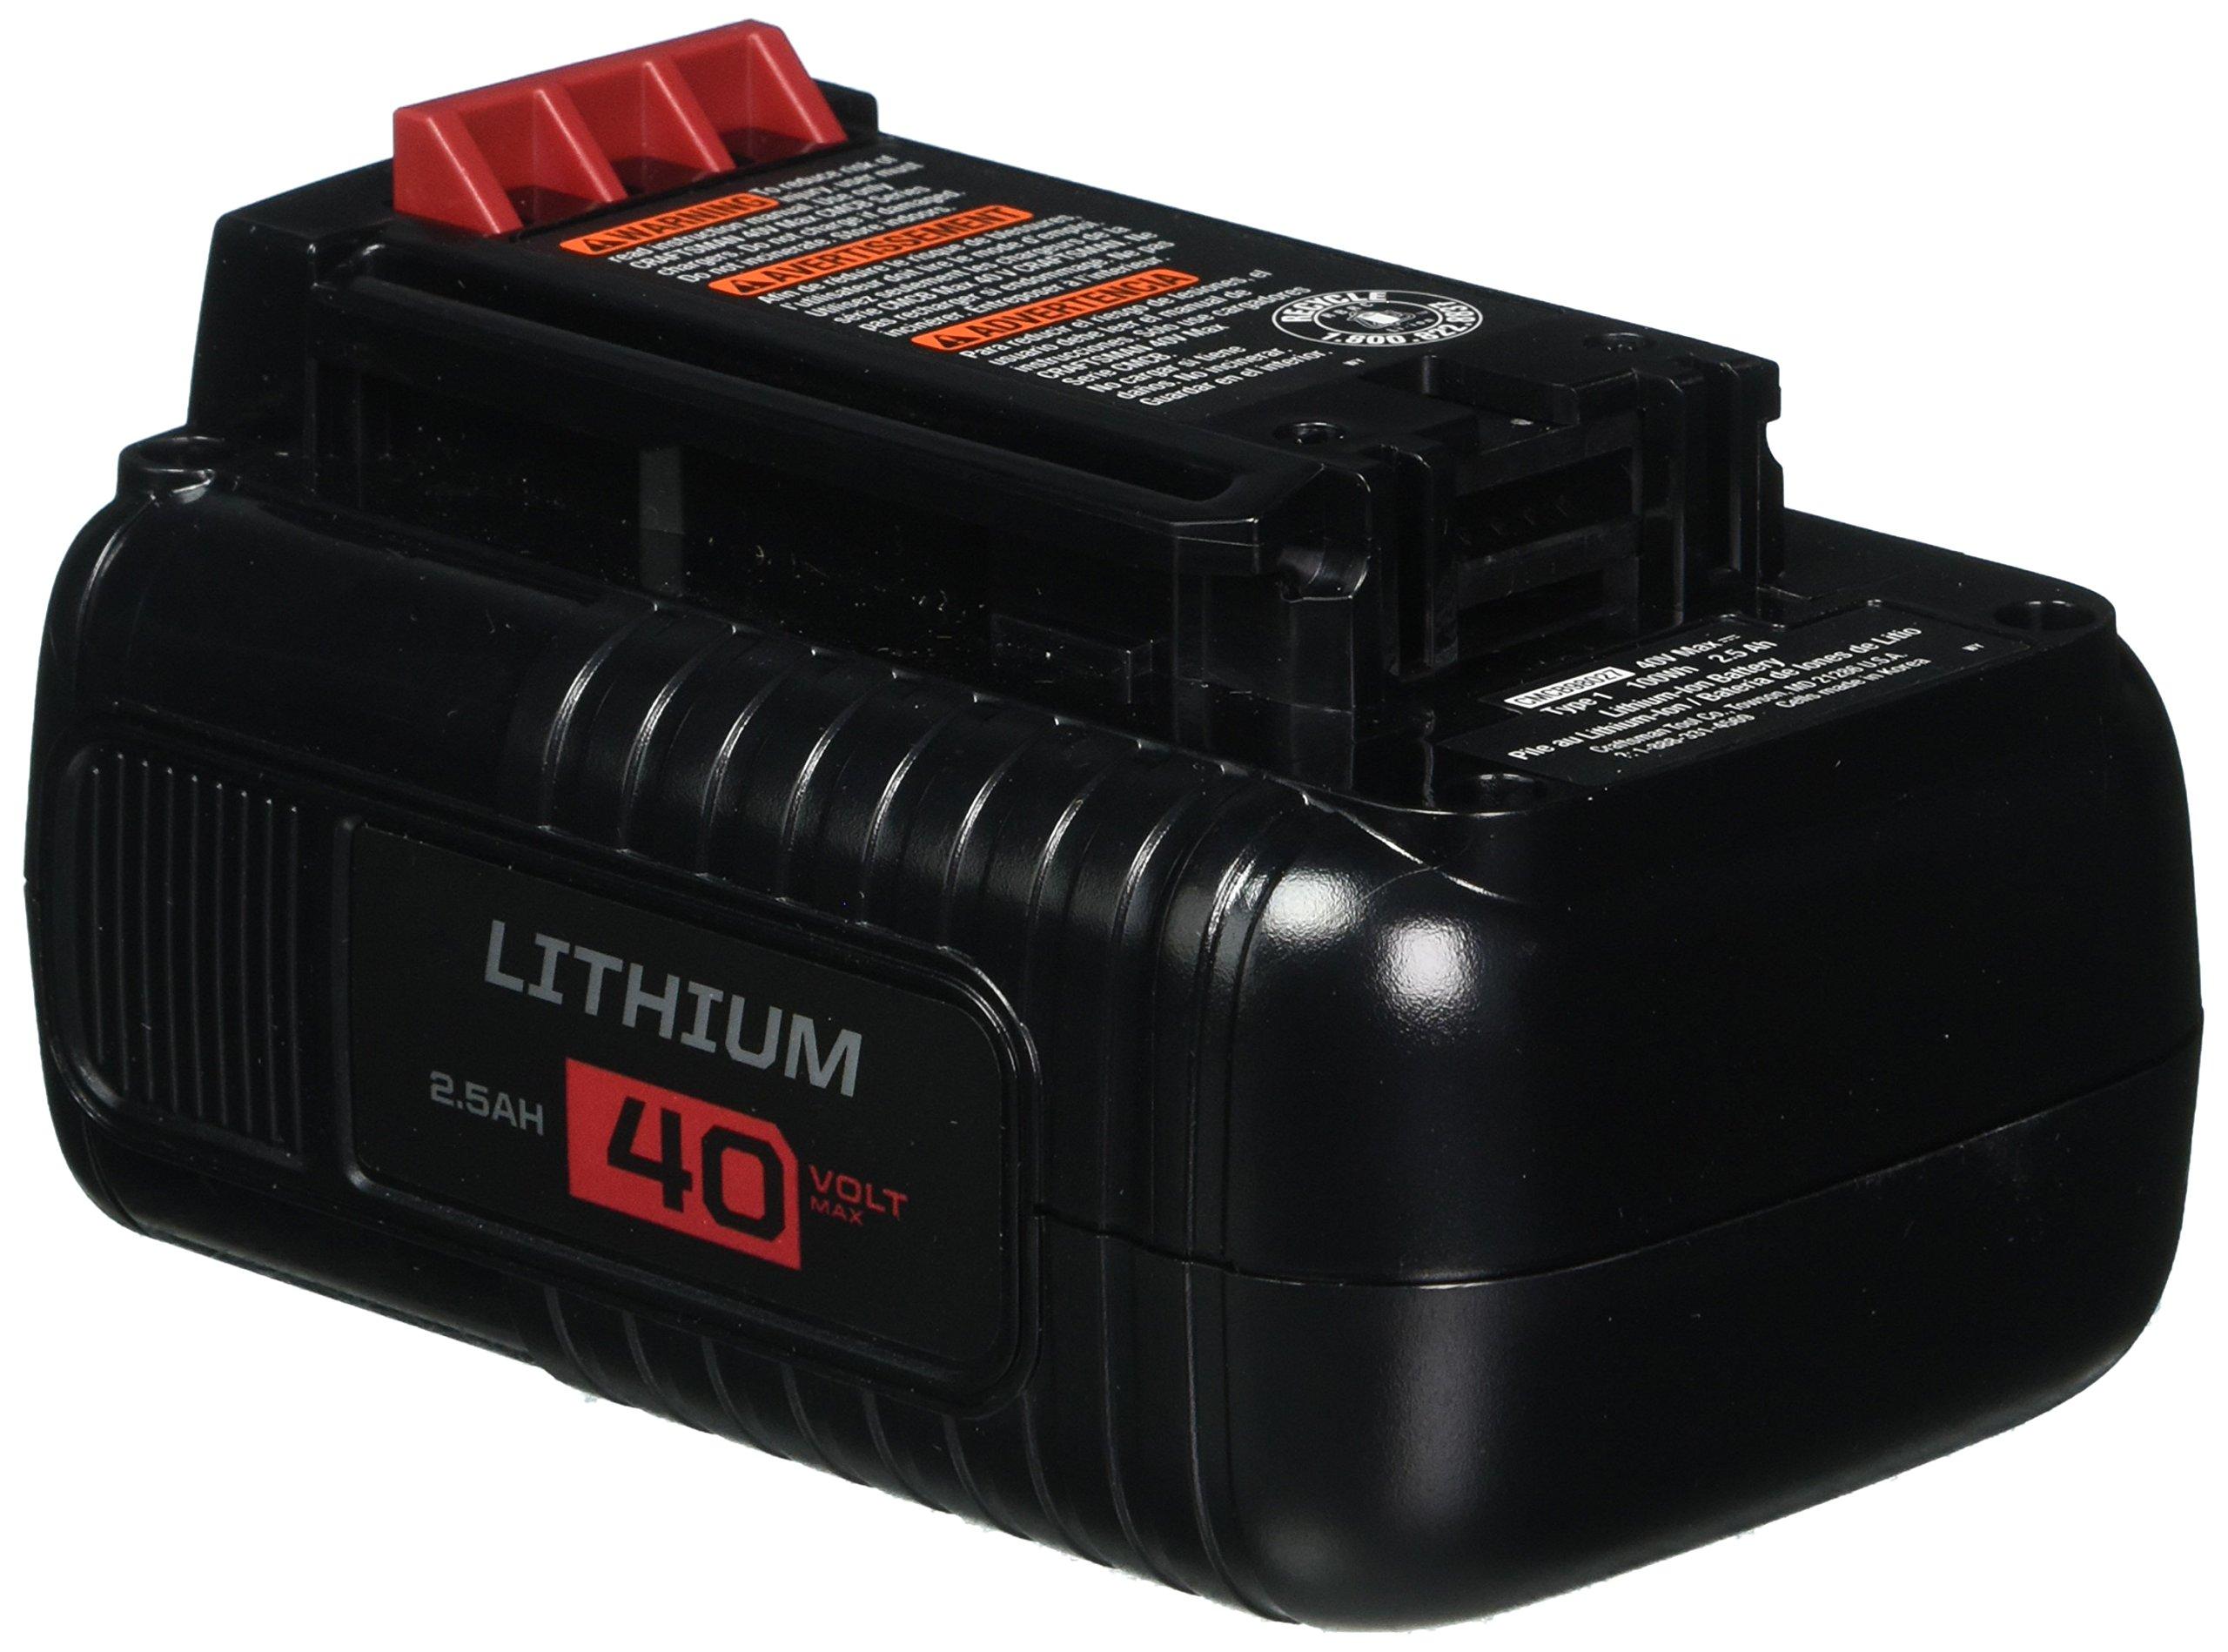 CRAFTSMAN 40V MAX Battery, Lithium Ion (CMCB98027)